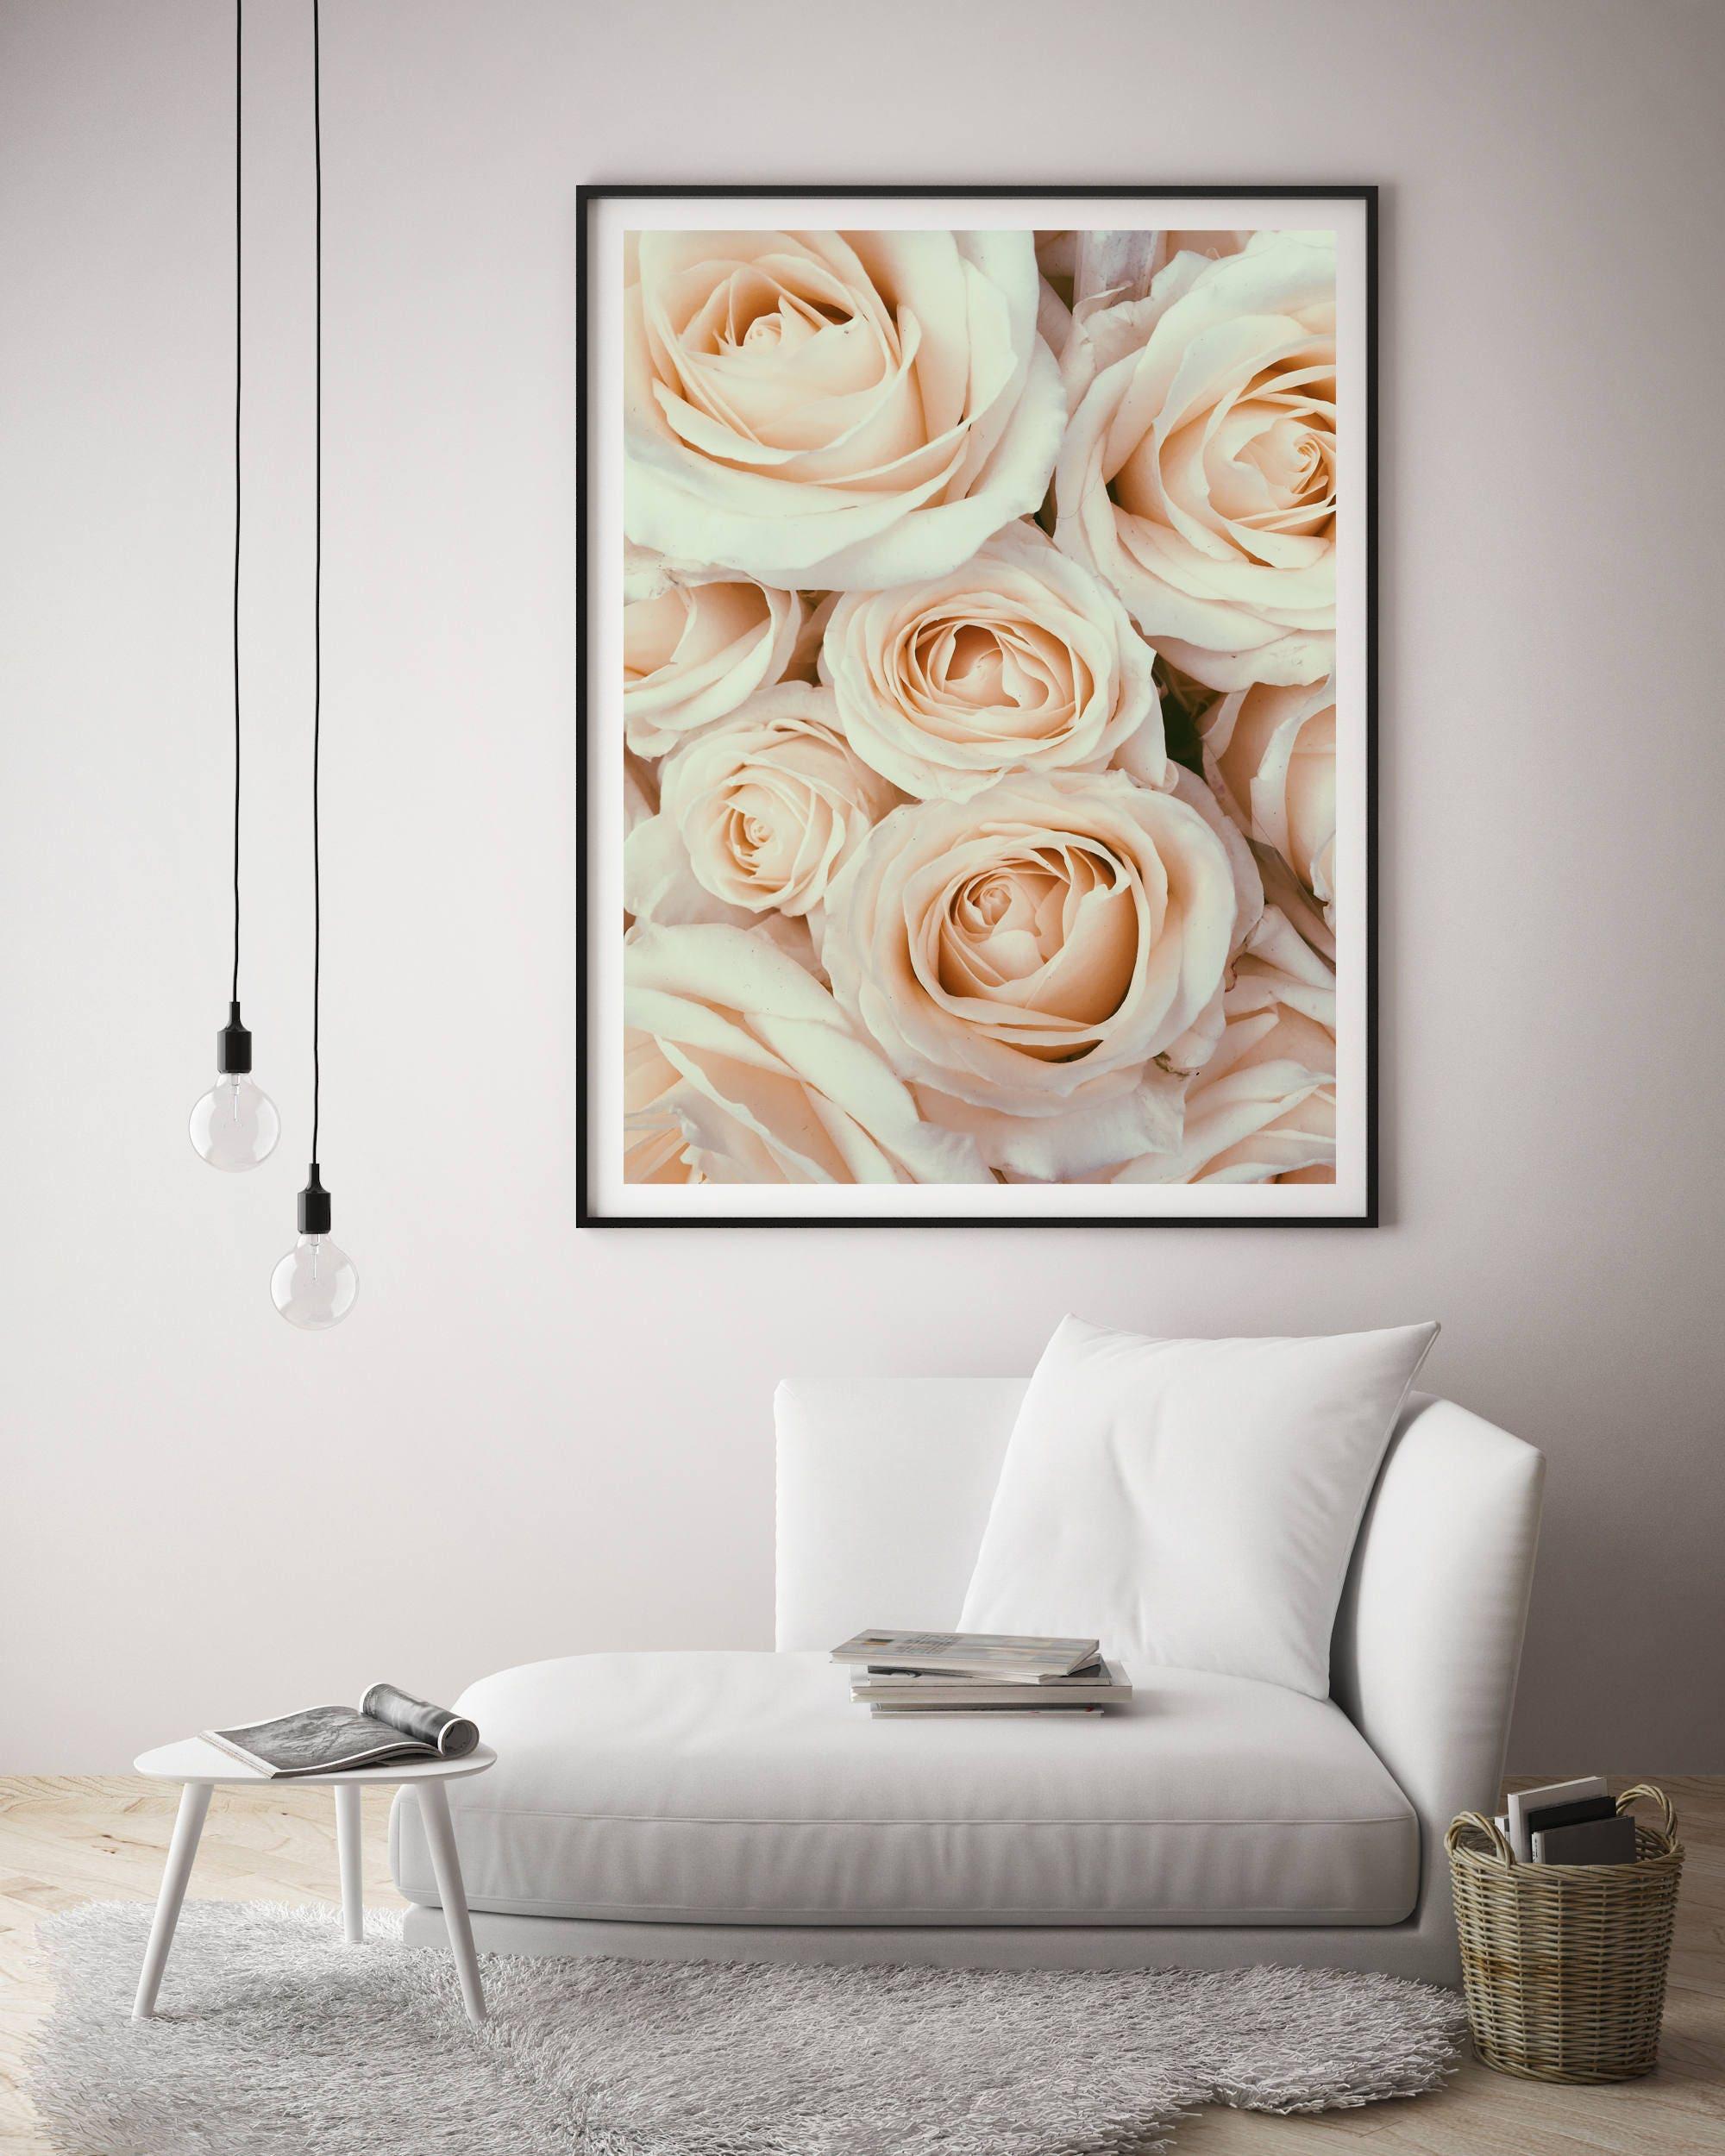 latitude cor d wayfair mirrored rose wall run reviews pillows crystal decor pdp